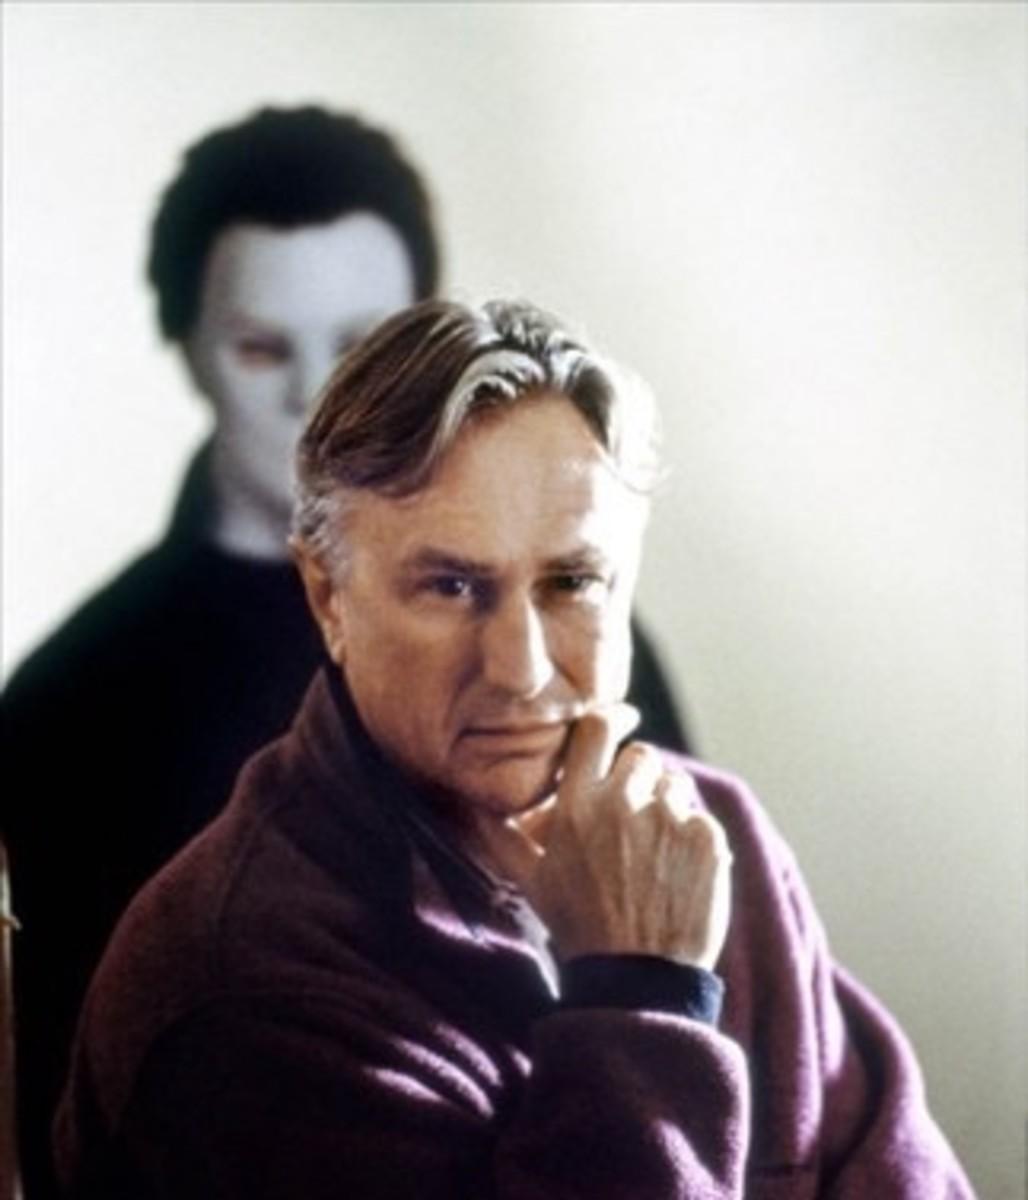 Director Steve Miner